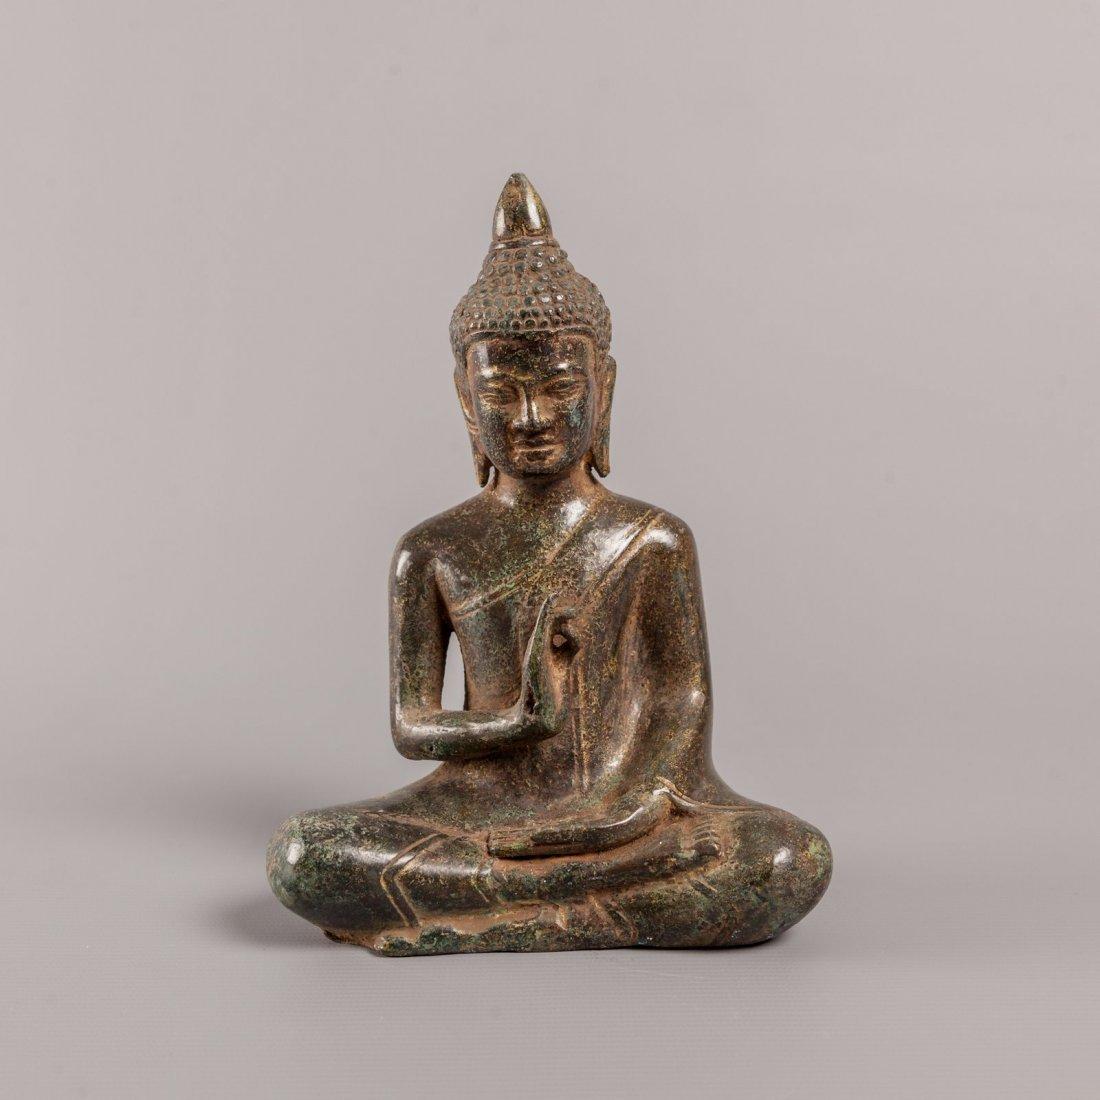 Delightful Antique Style Cambodian Bronze Seated Buddha